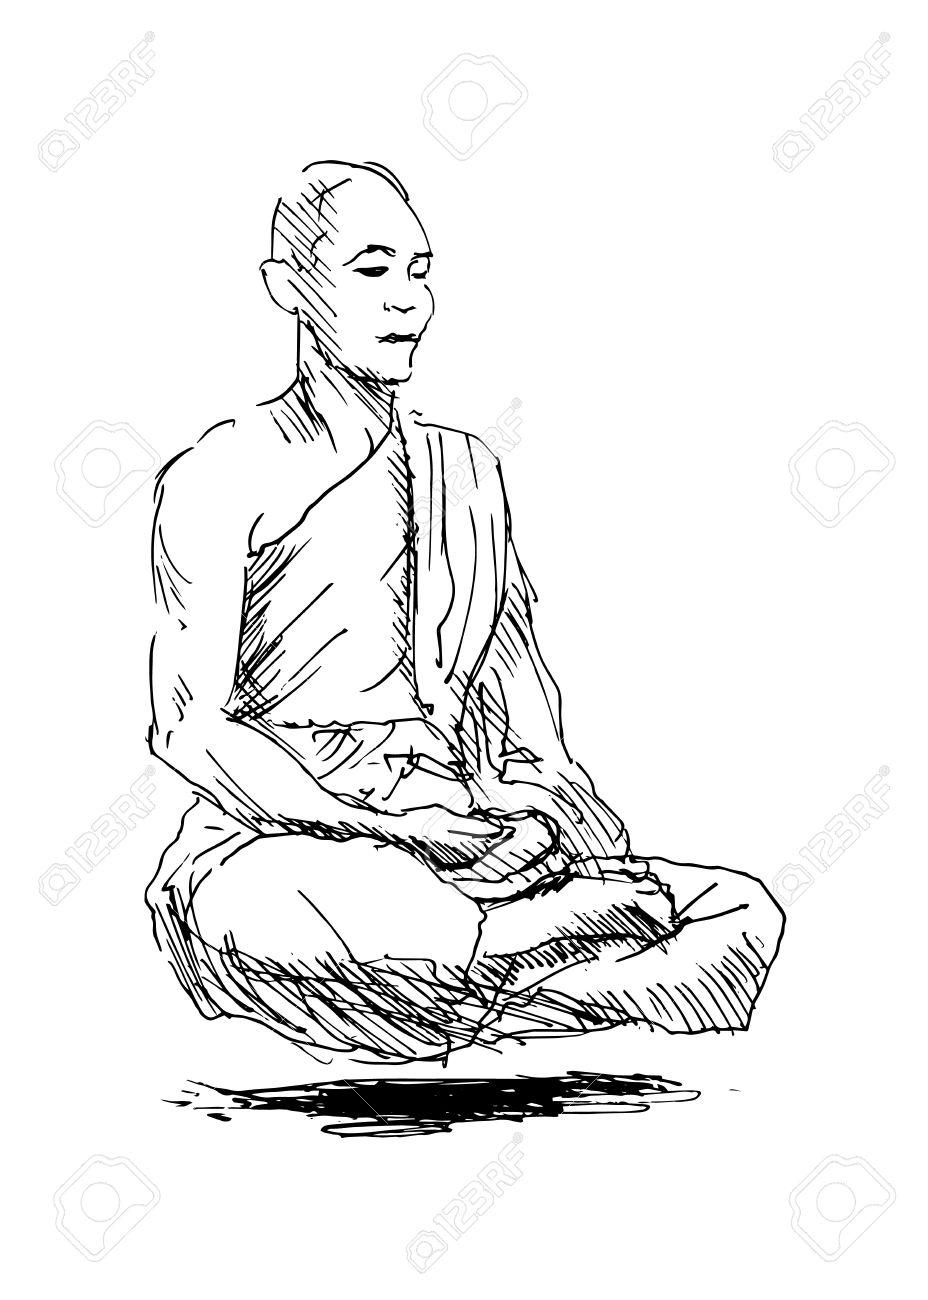 928x1300 Hand Sketch Meditating Monk Royalty Free Cliparts, Vectors,